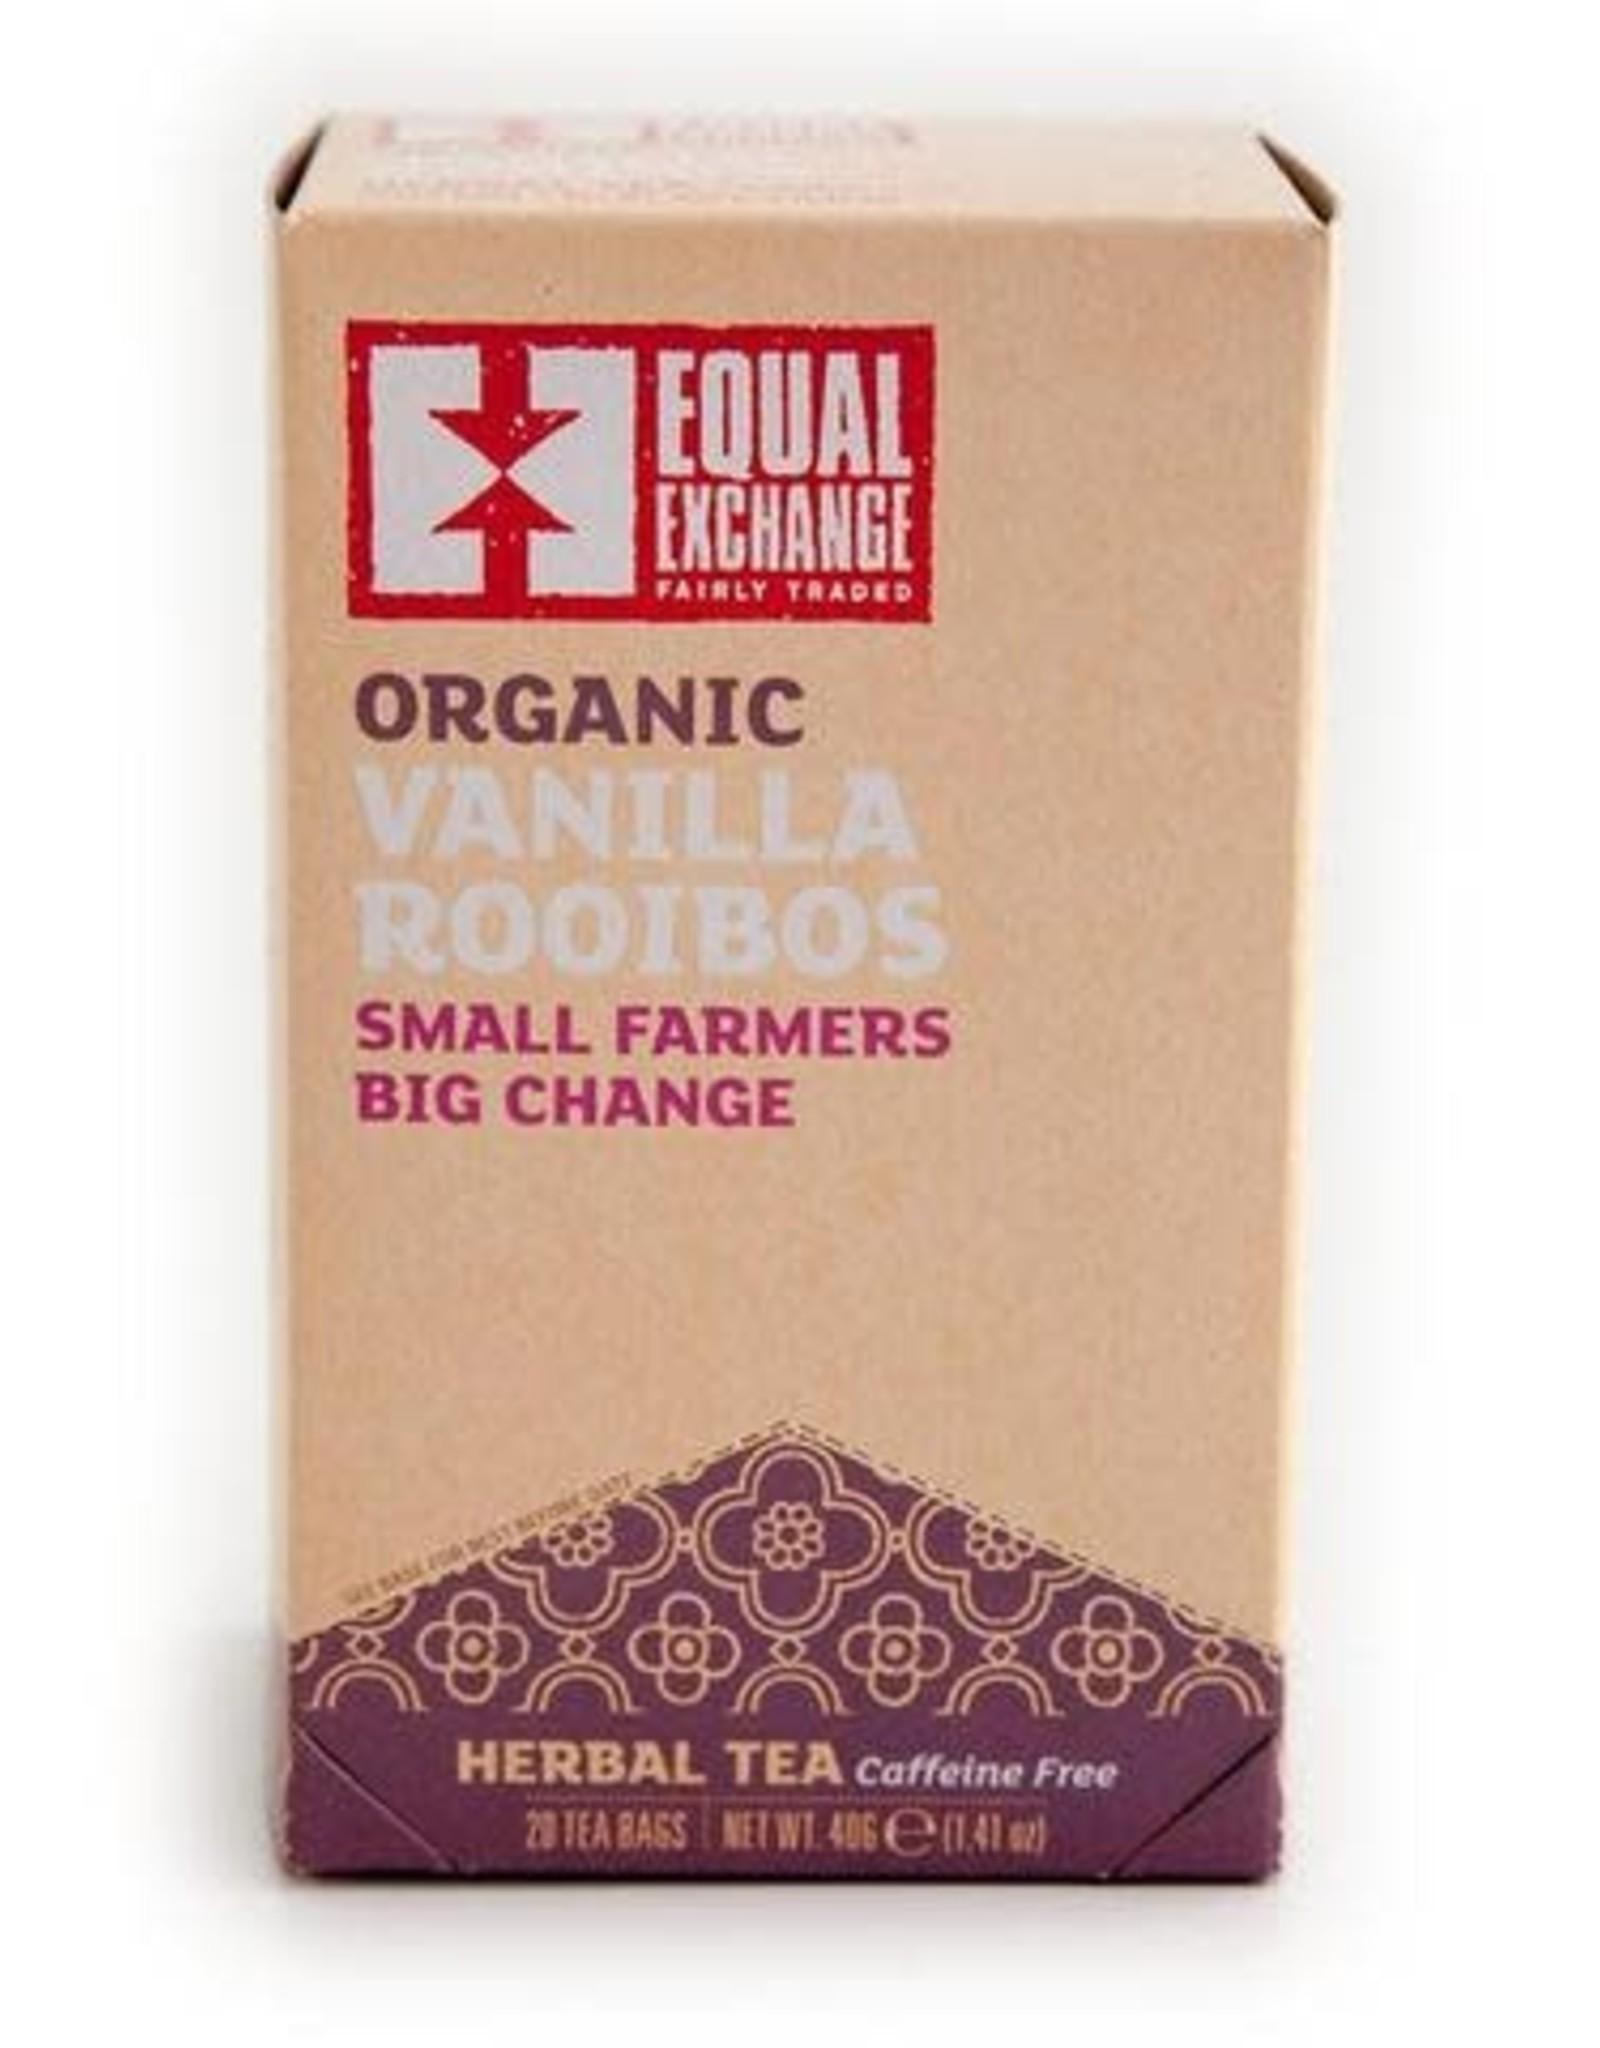 Organic Vanilla Rooibos